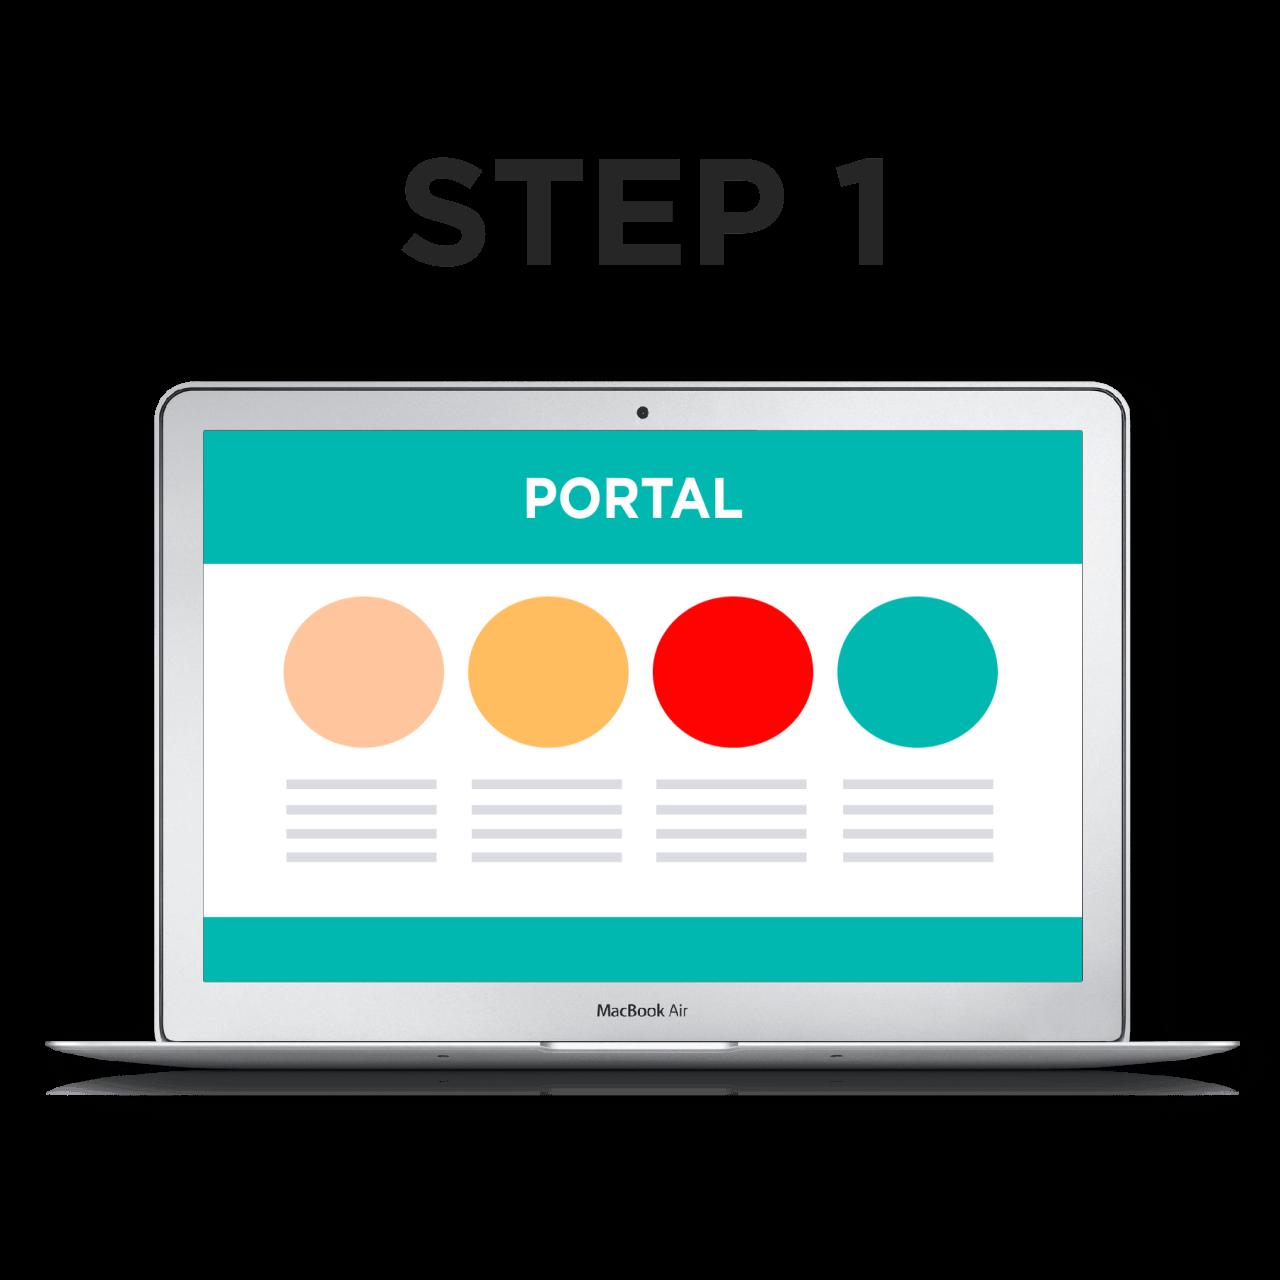 KeyToPortal Authenticator Step 1